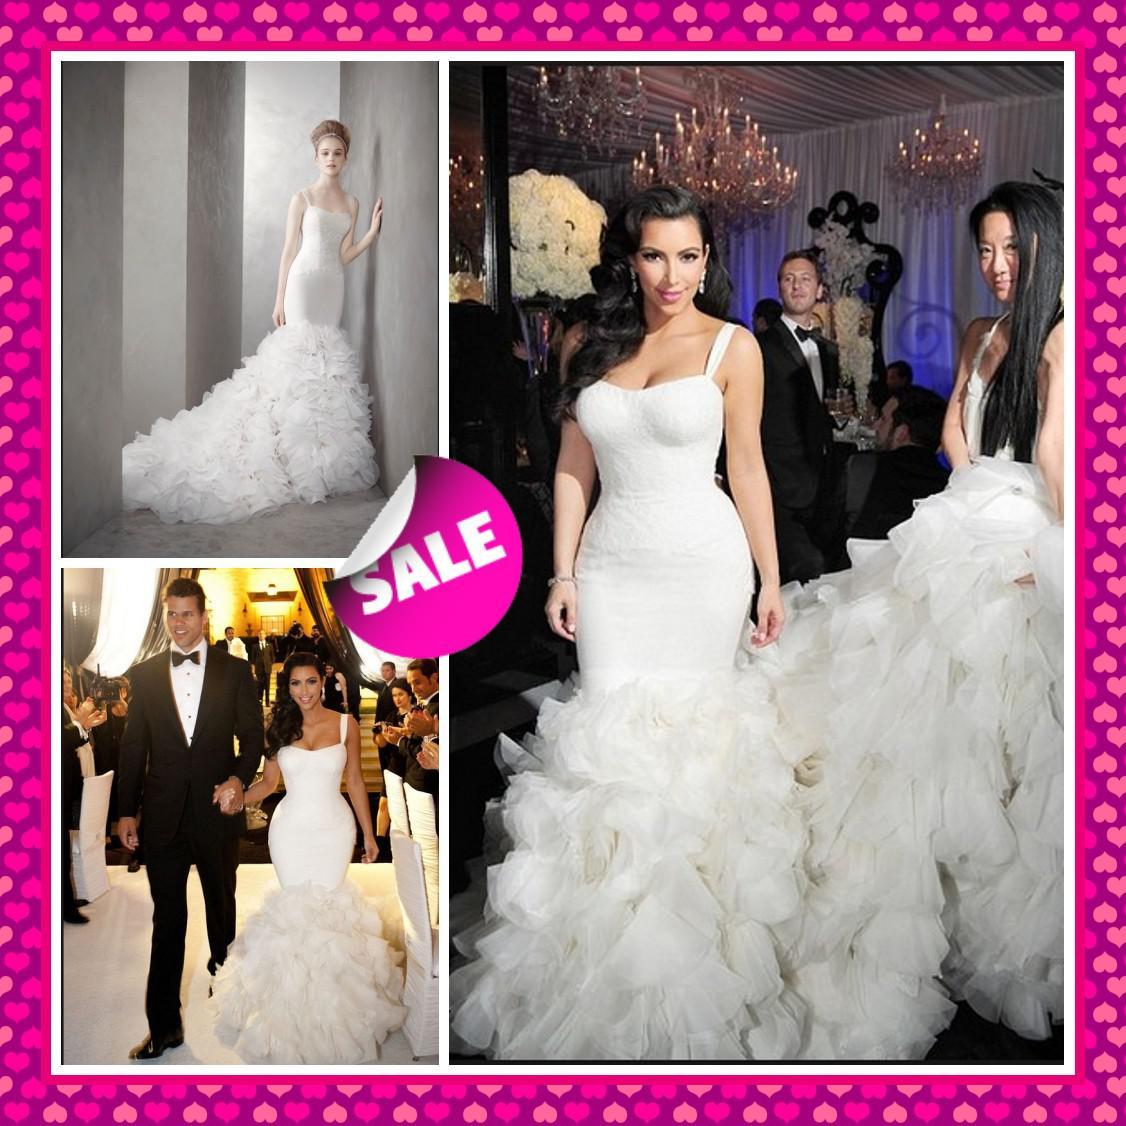 celebrity beach wedding dresses | Wedding